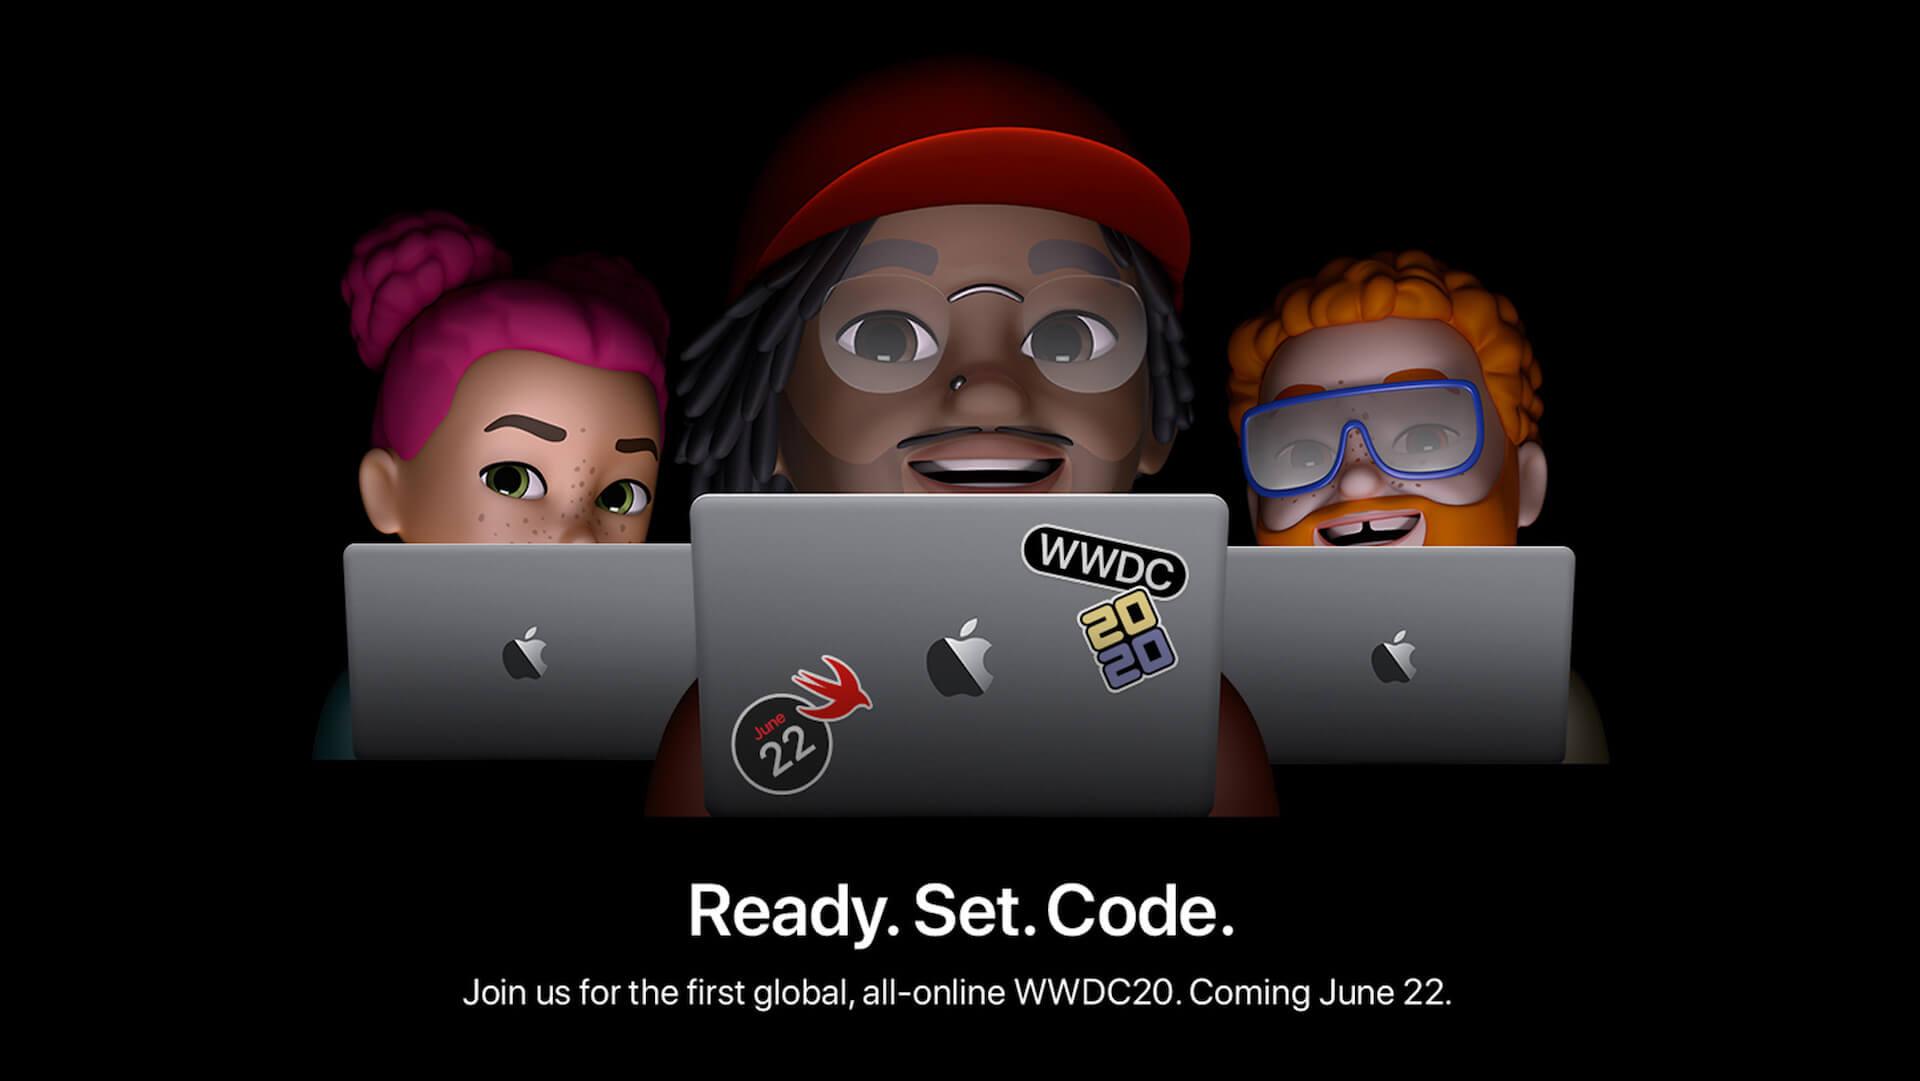 Face ID搭載のMacBookが近日中に登場!?6月開催の<WWDC>で発表の可能性 tech200518_macbook_2